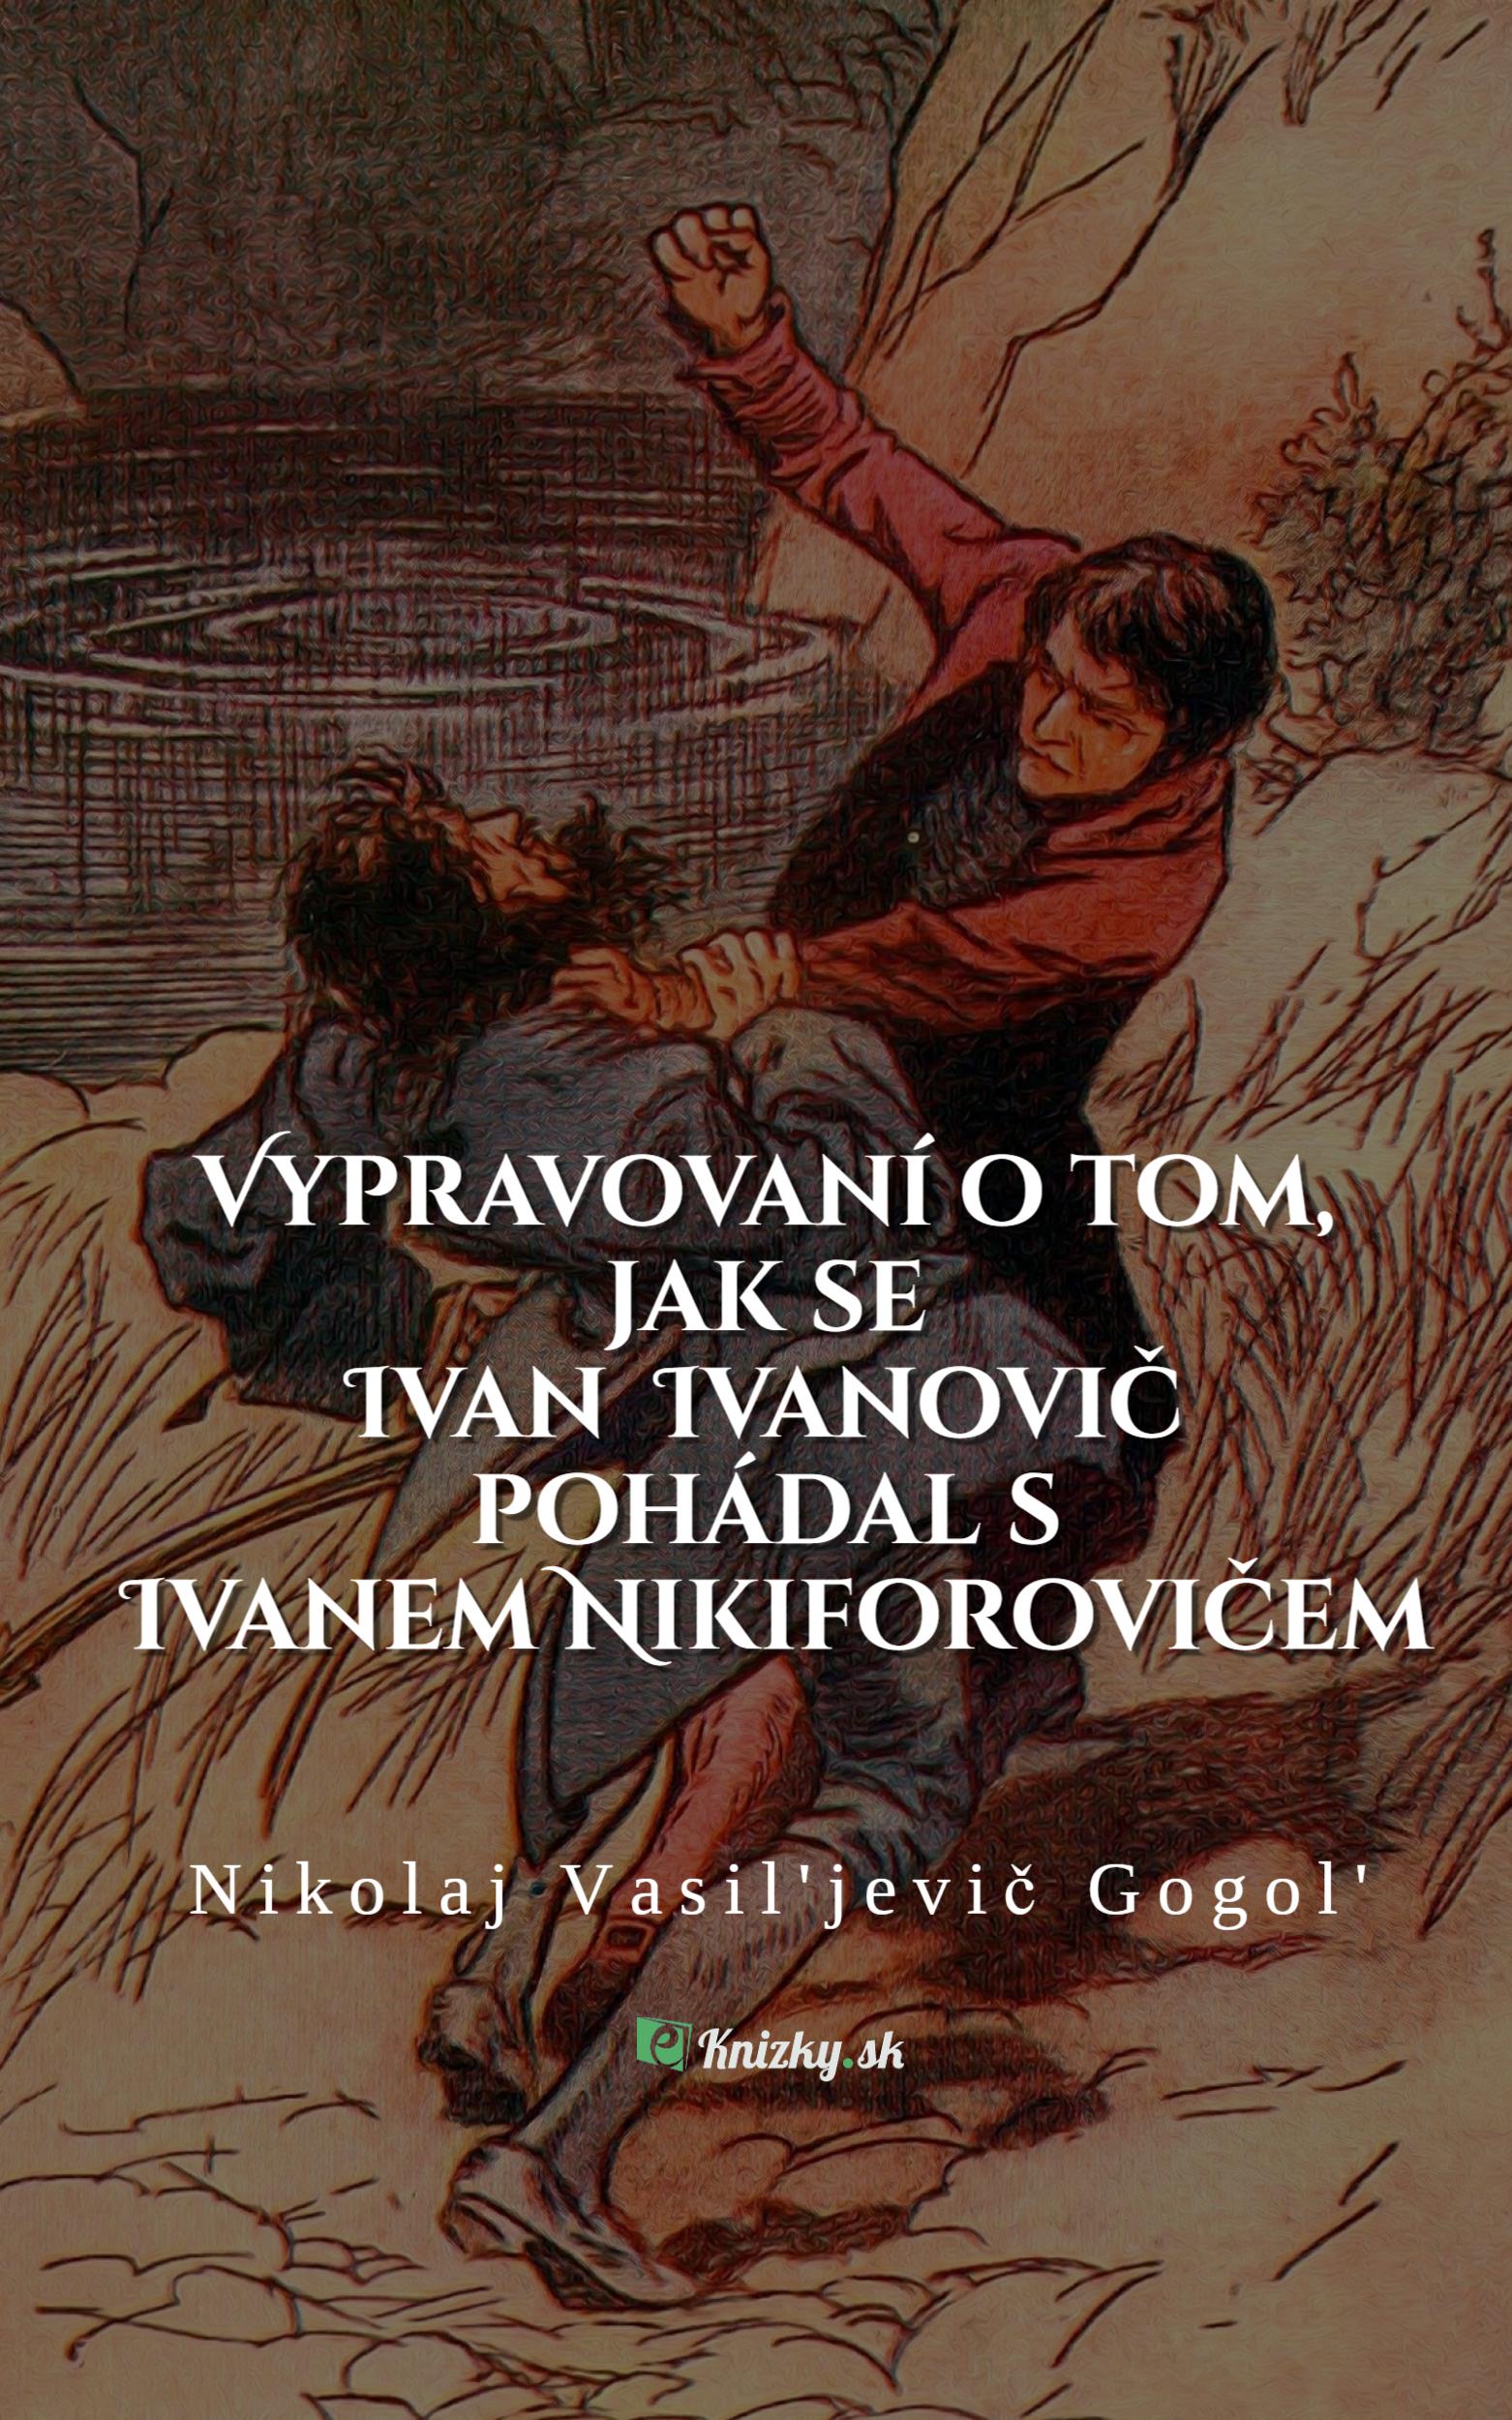 Vypravovani o tom jak se Ivan Ivanovic pohadal s Ivanem Nikiforovicem gogol eknizky